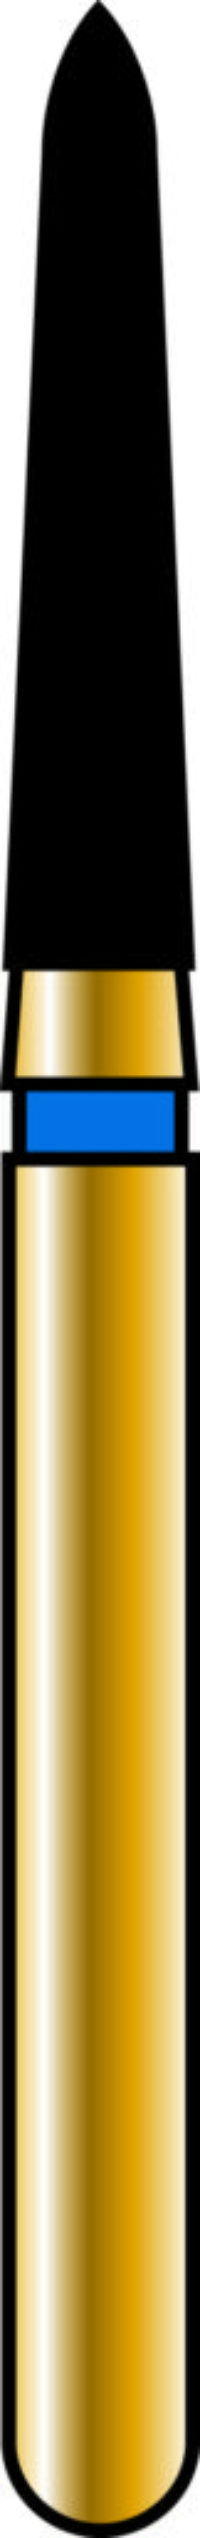 Pointed Taper 16-8mm Gold Diamond Bur